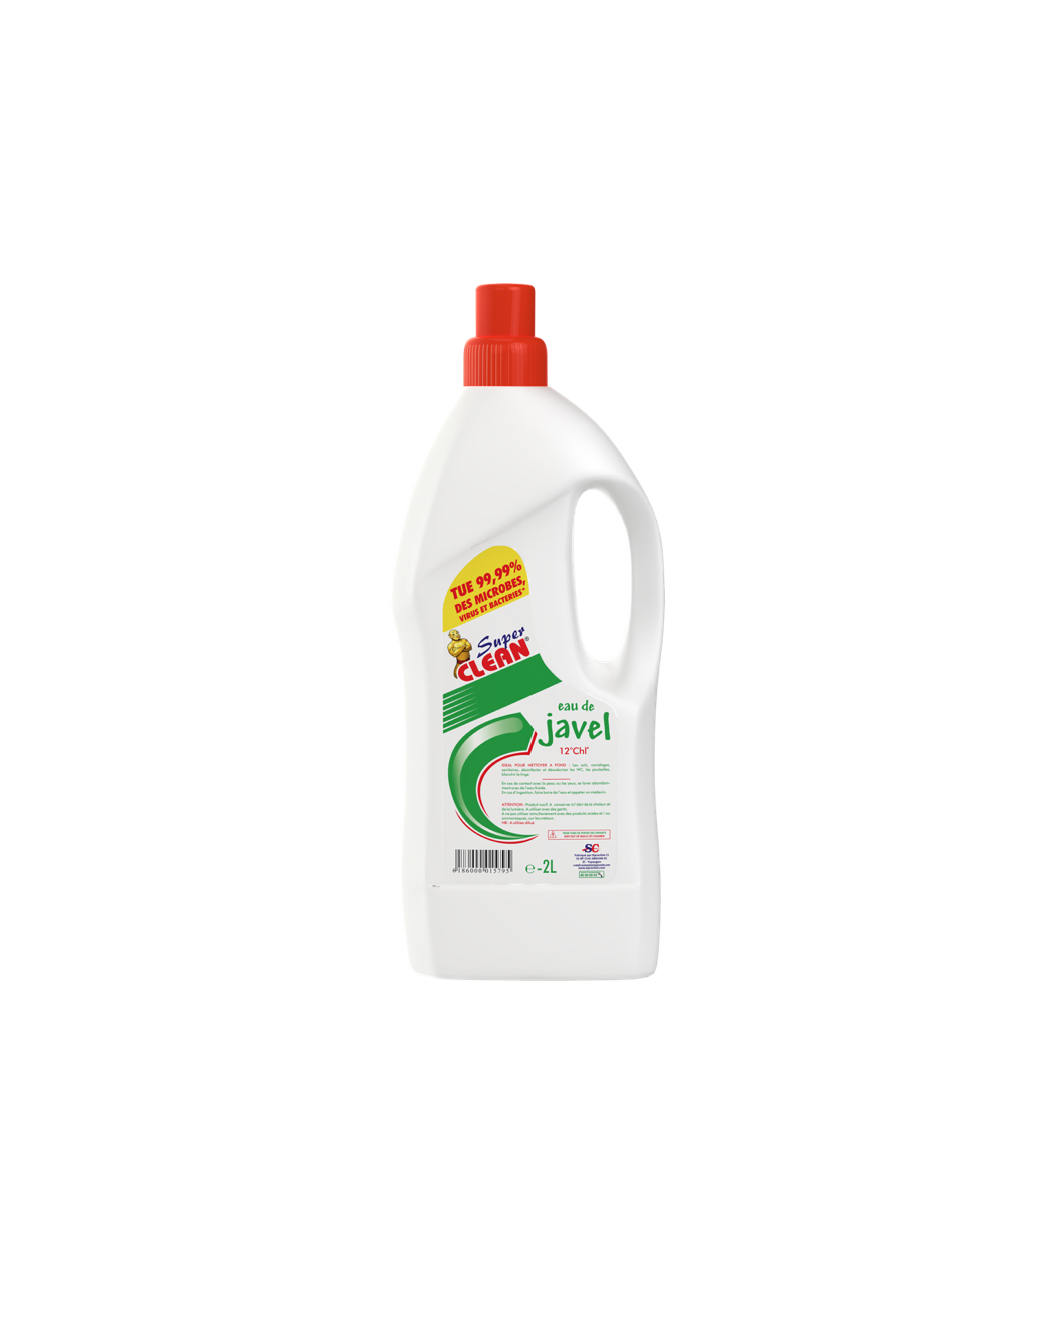 SUPER CLEAN_Eau de Javel 12° 2L